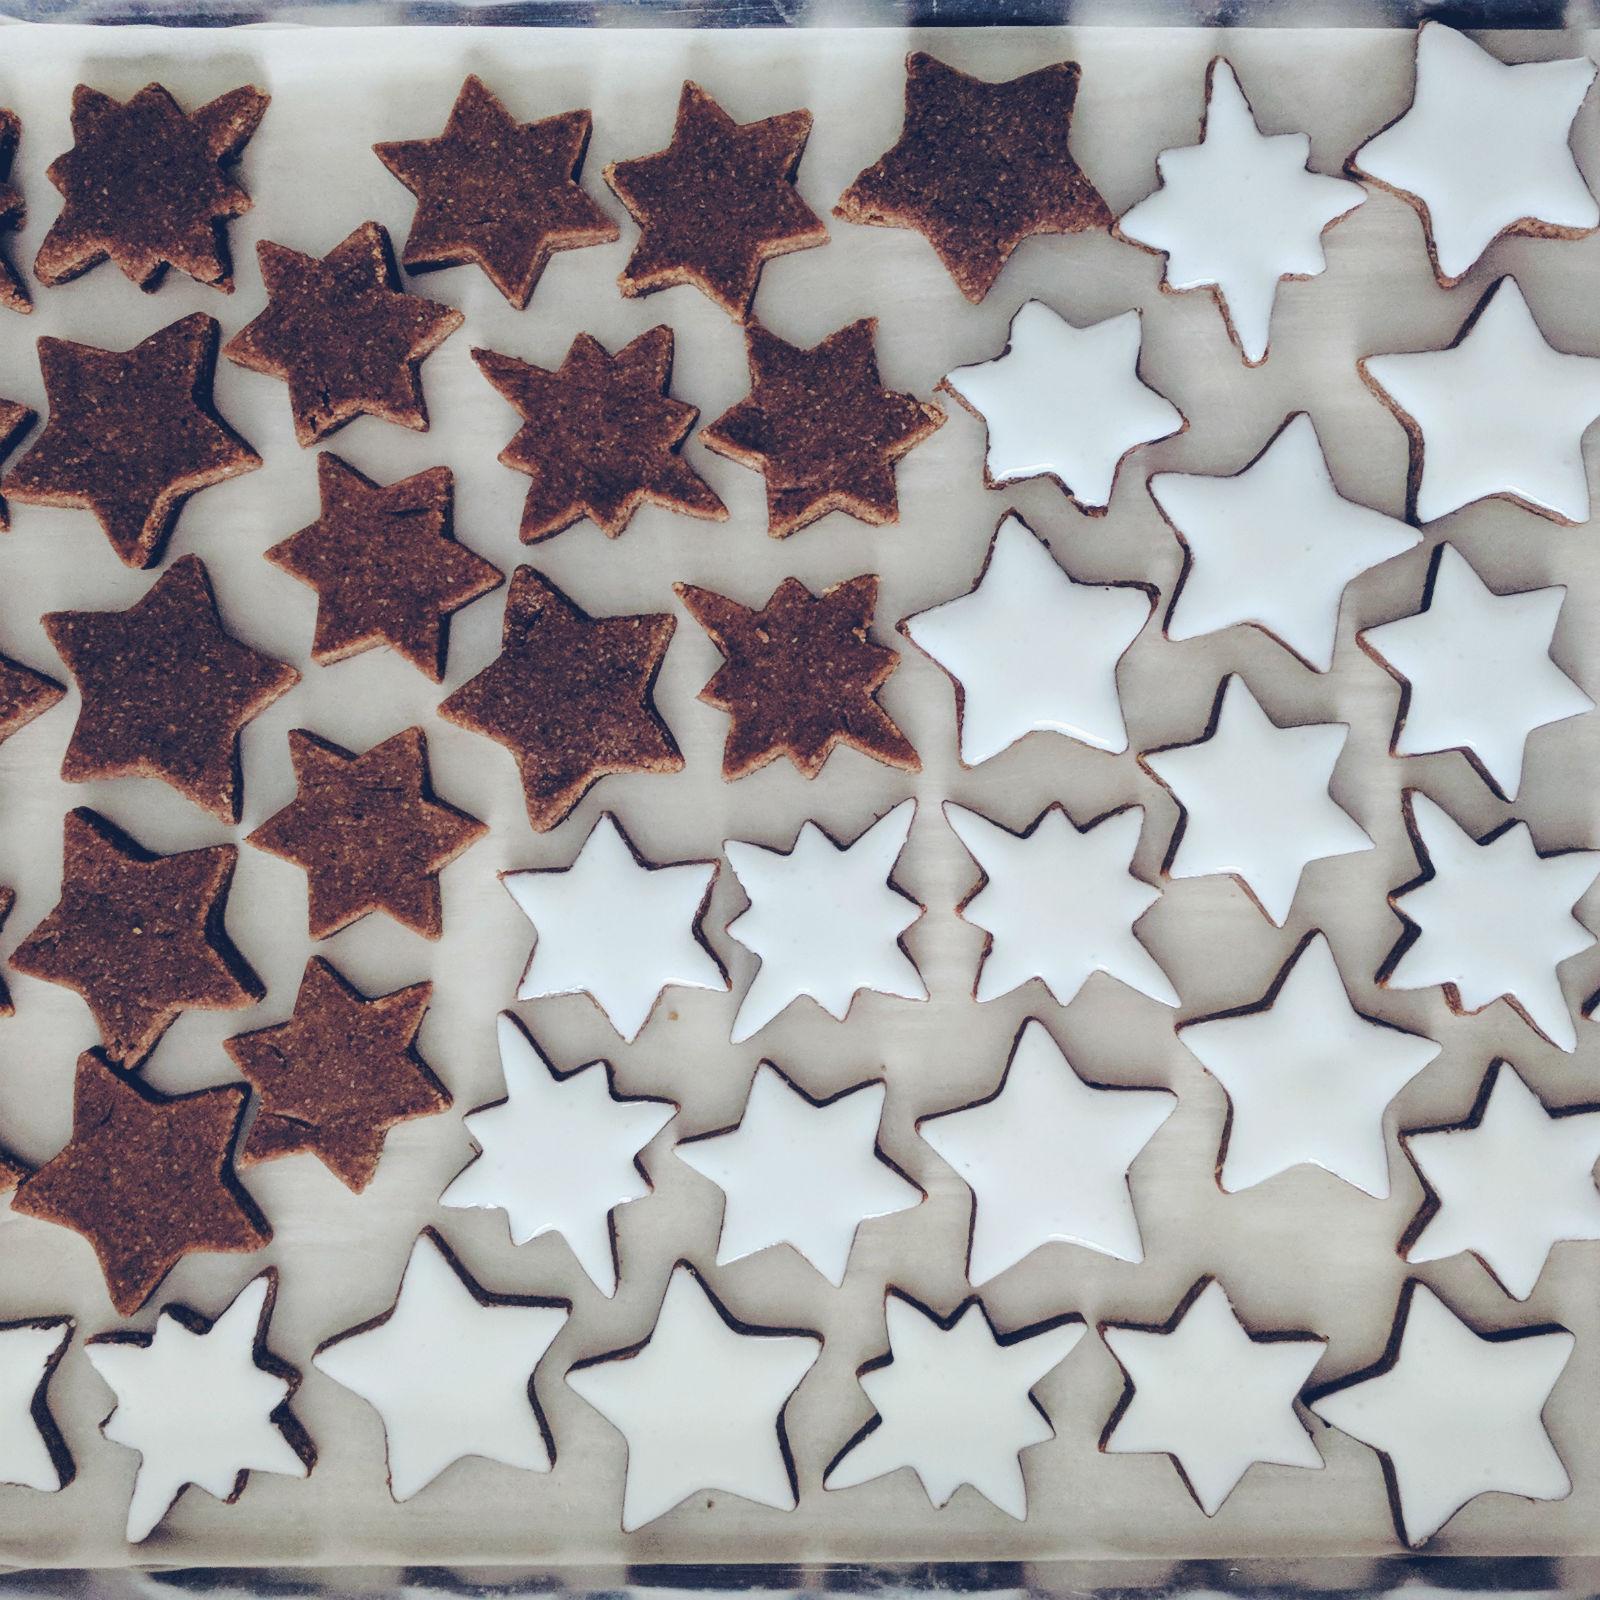 Zimtsterne, cinnamon stars, process shot.